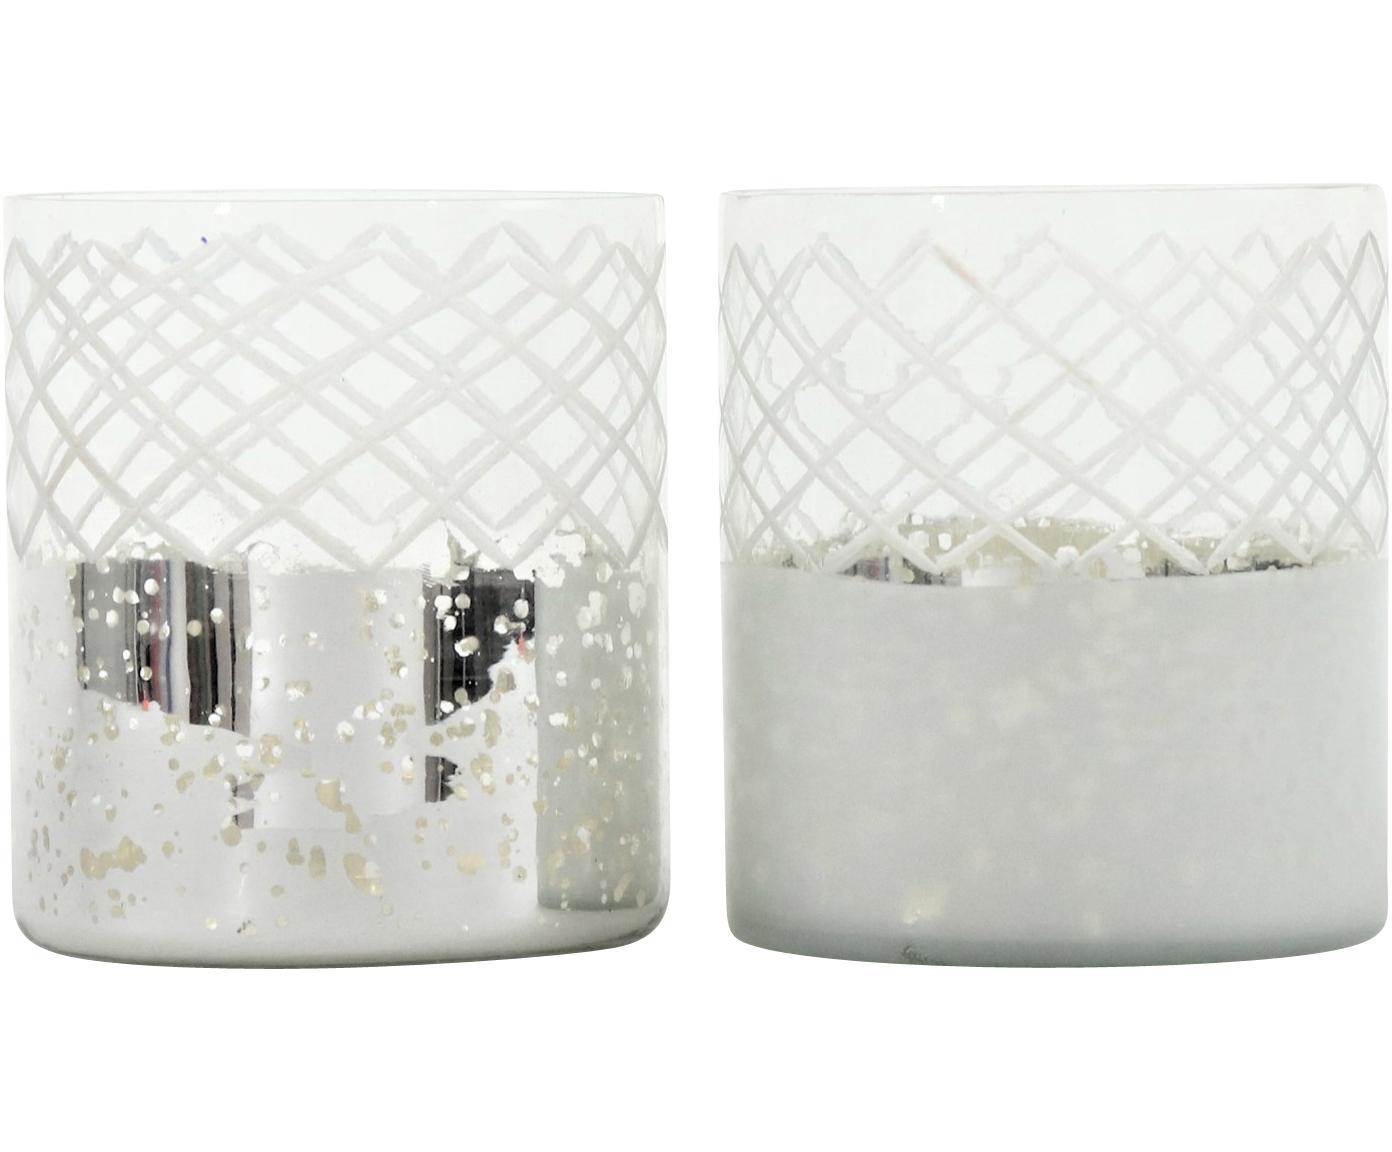 Set de portavelas Lustro, 2pzas., Vidrio, Plateado, transparente, Ø 12 x Al 17 cm